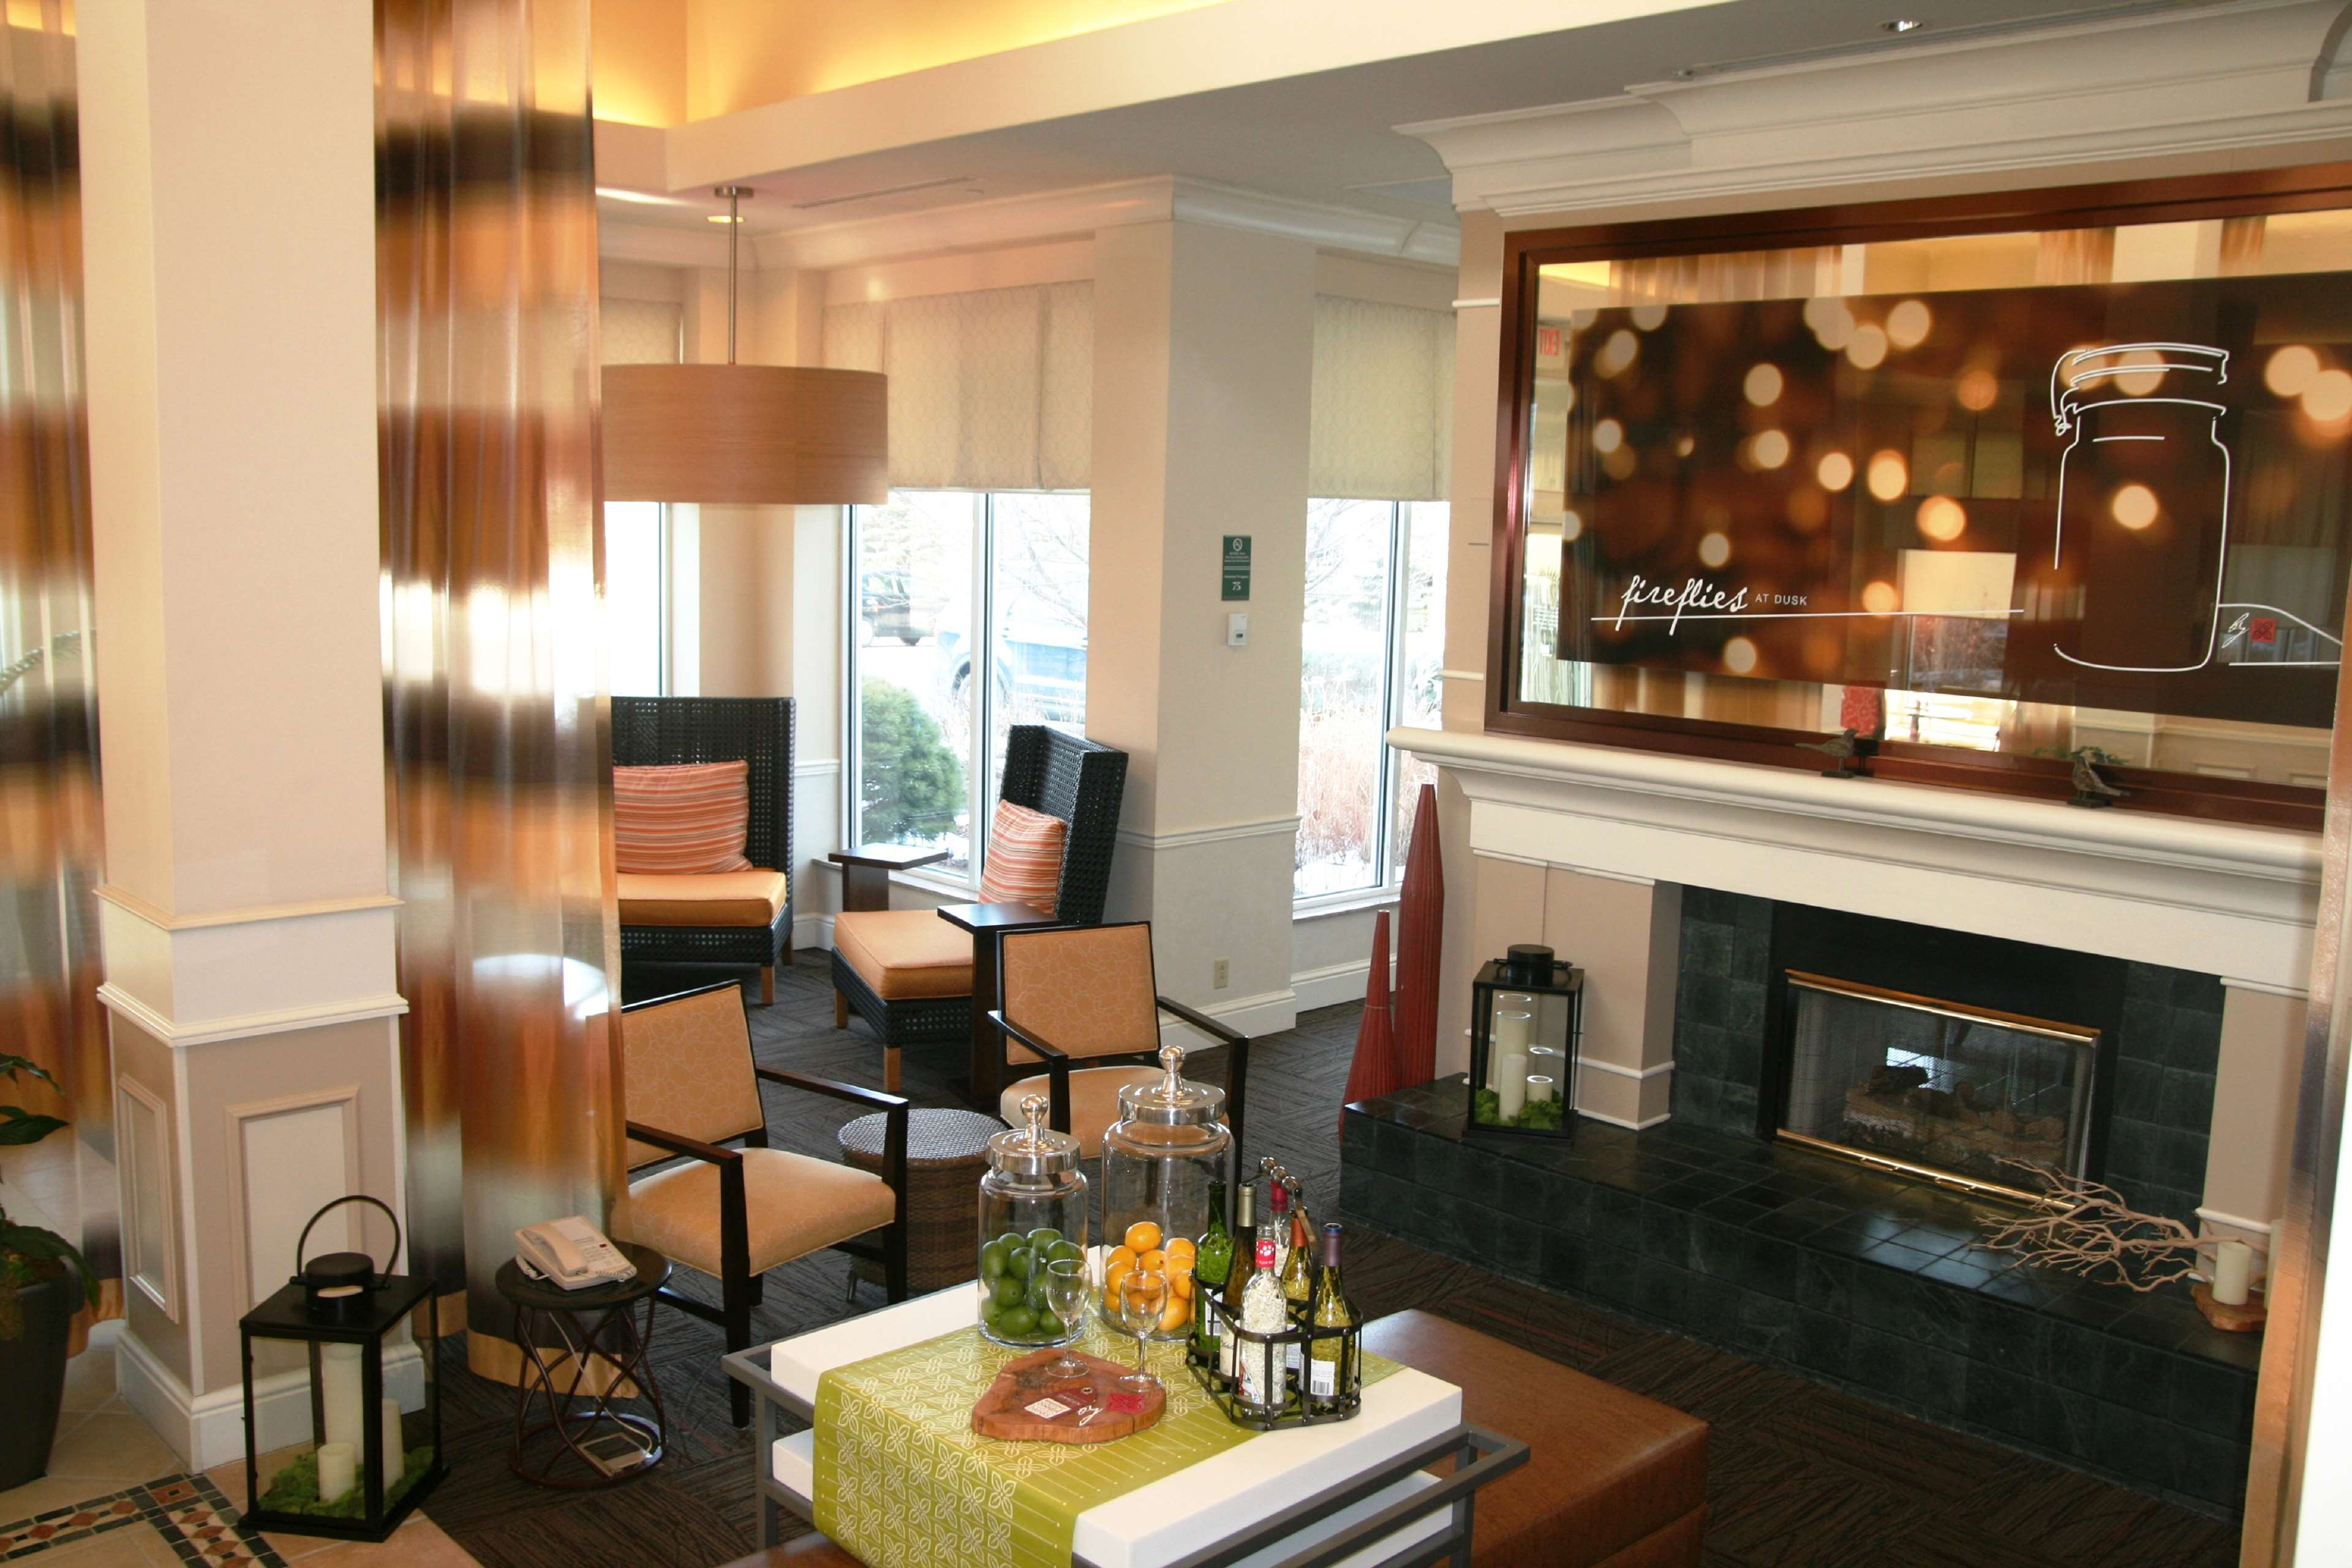 Hilton Garden Inn Elmira/Corning image 8